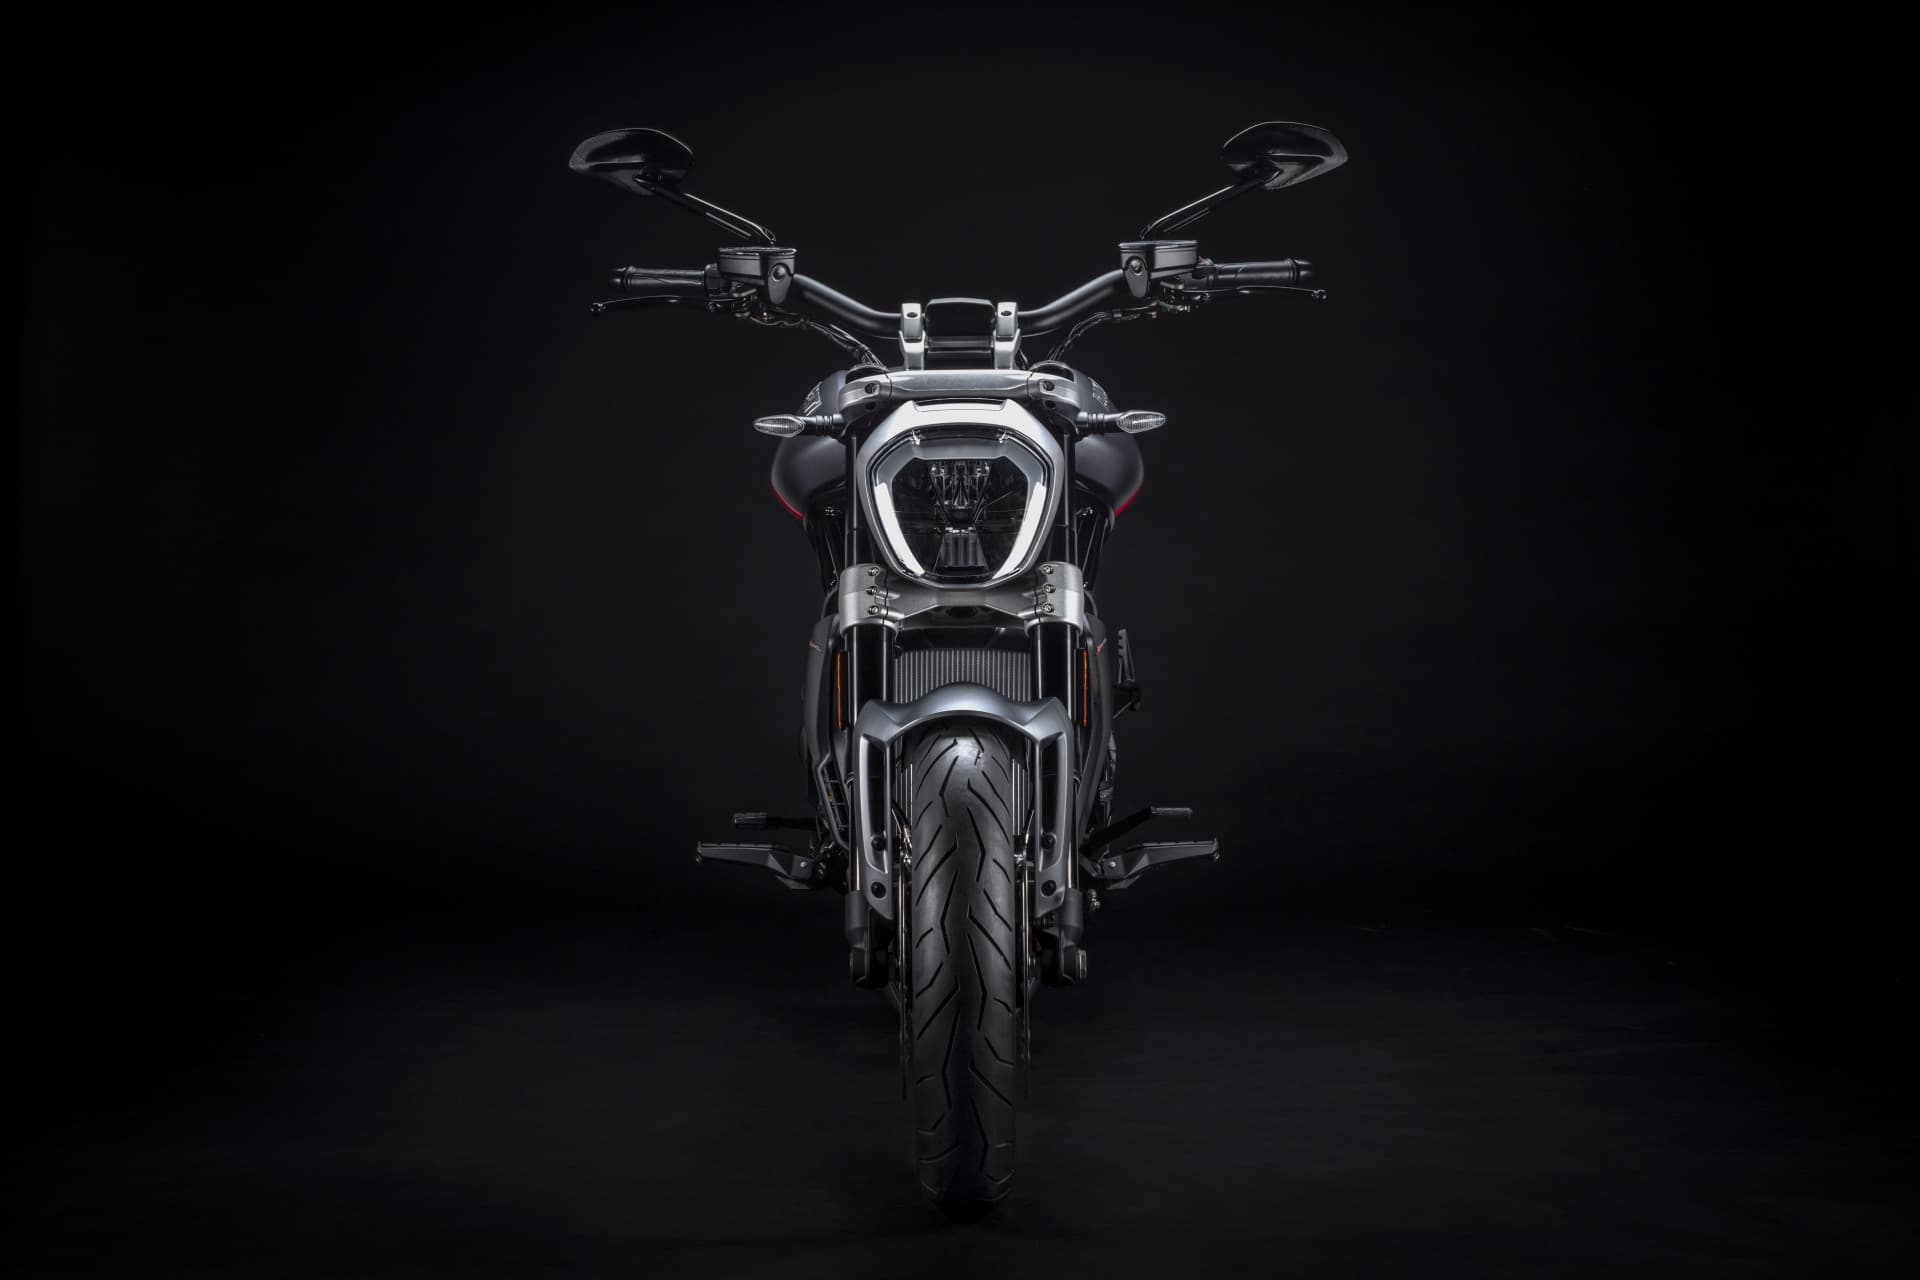 Ducati Xdiavel Black Star 2021 04